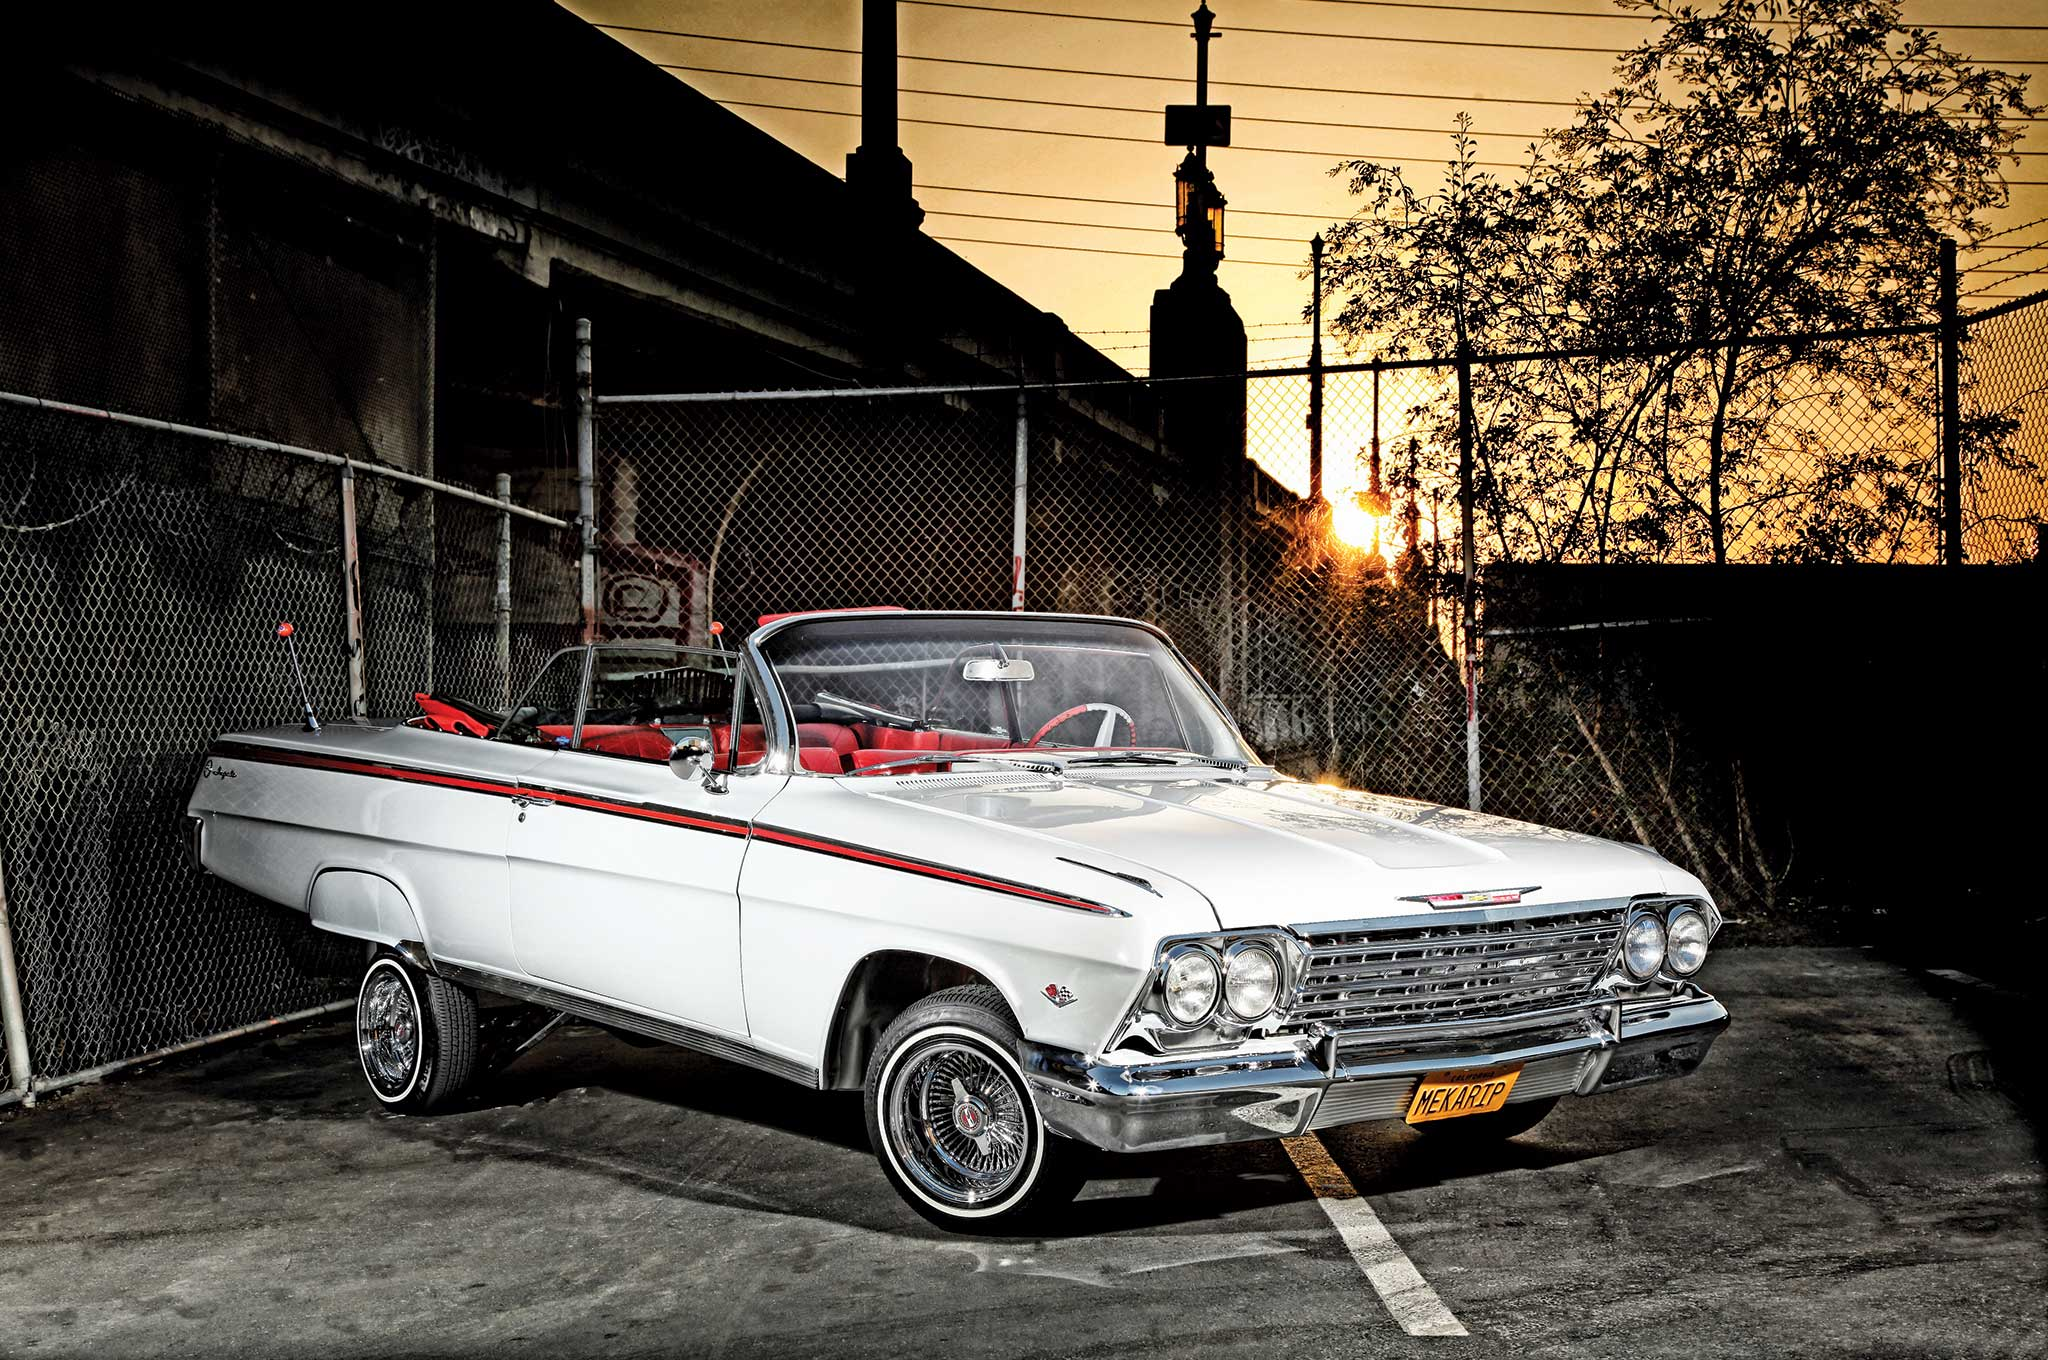 1962 Chevrolet Impala Convertible Never Quit Lowrider